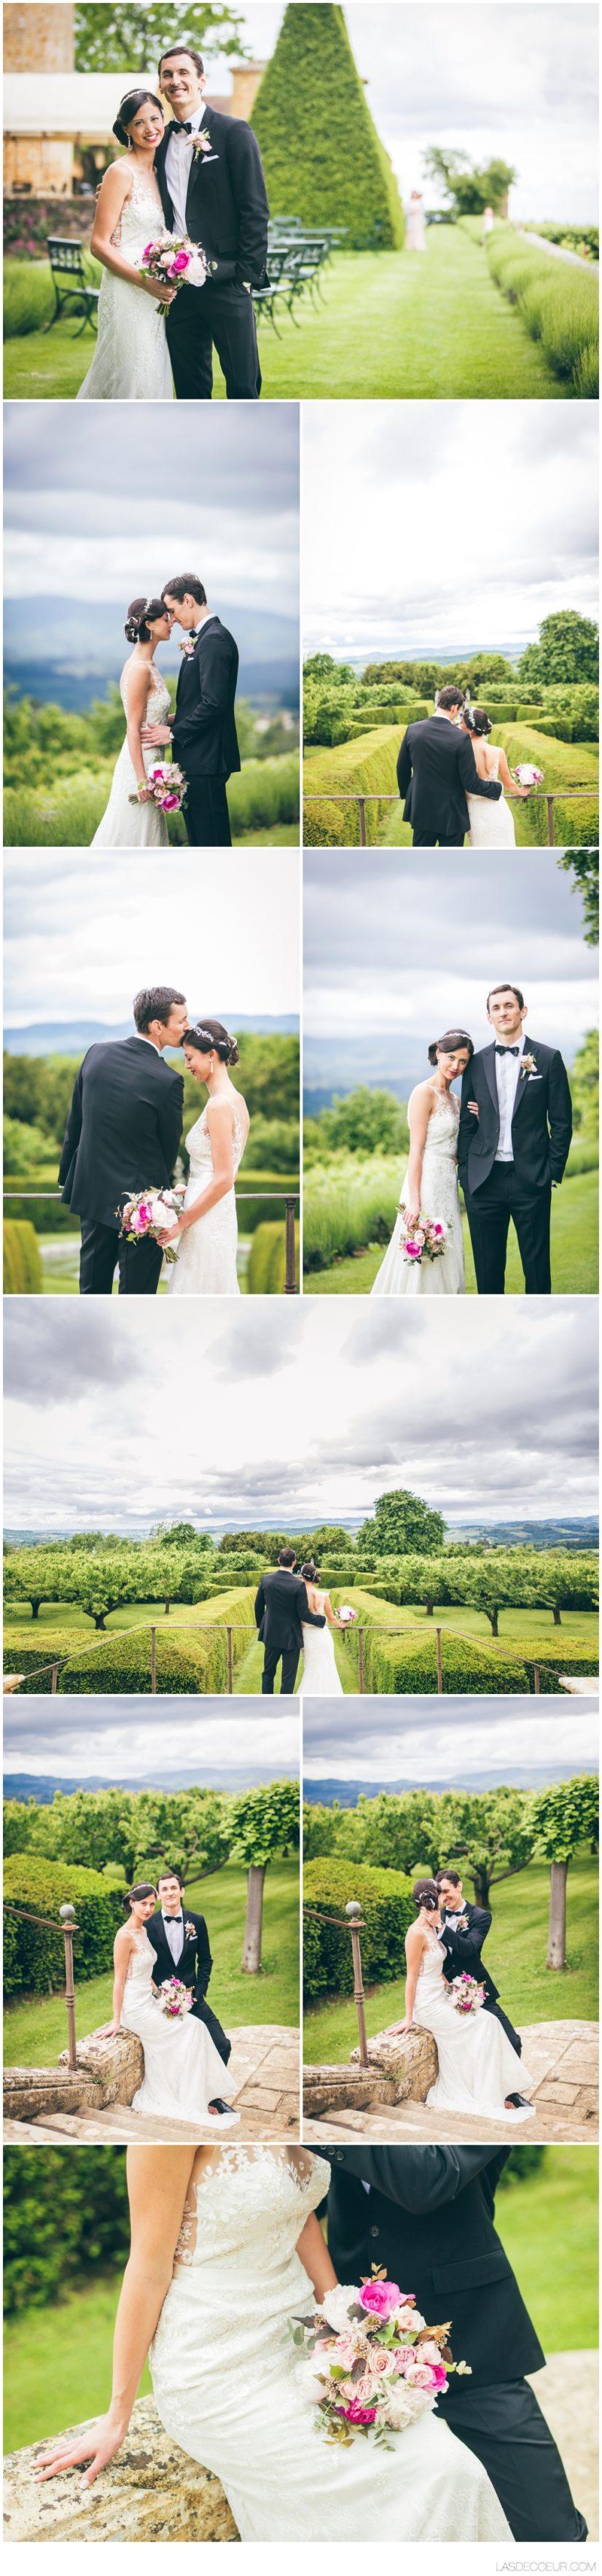 Photo mariage Chateau Bagnols 10